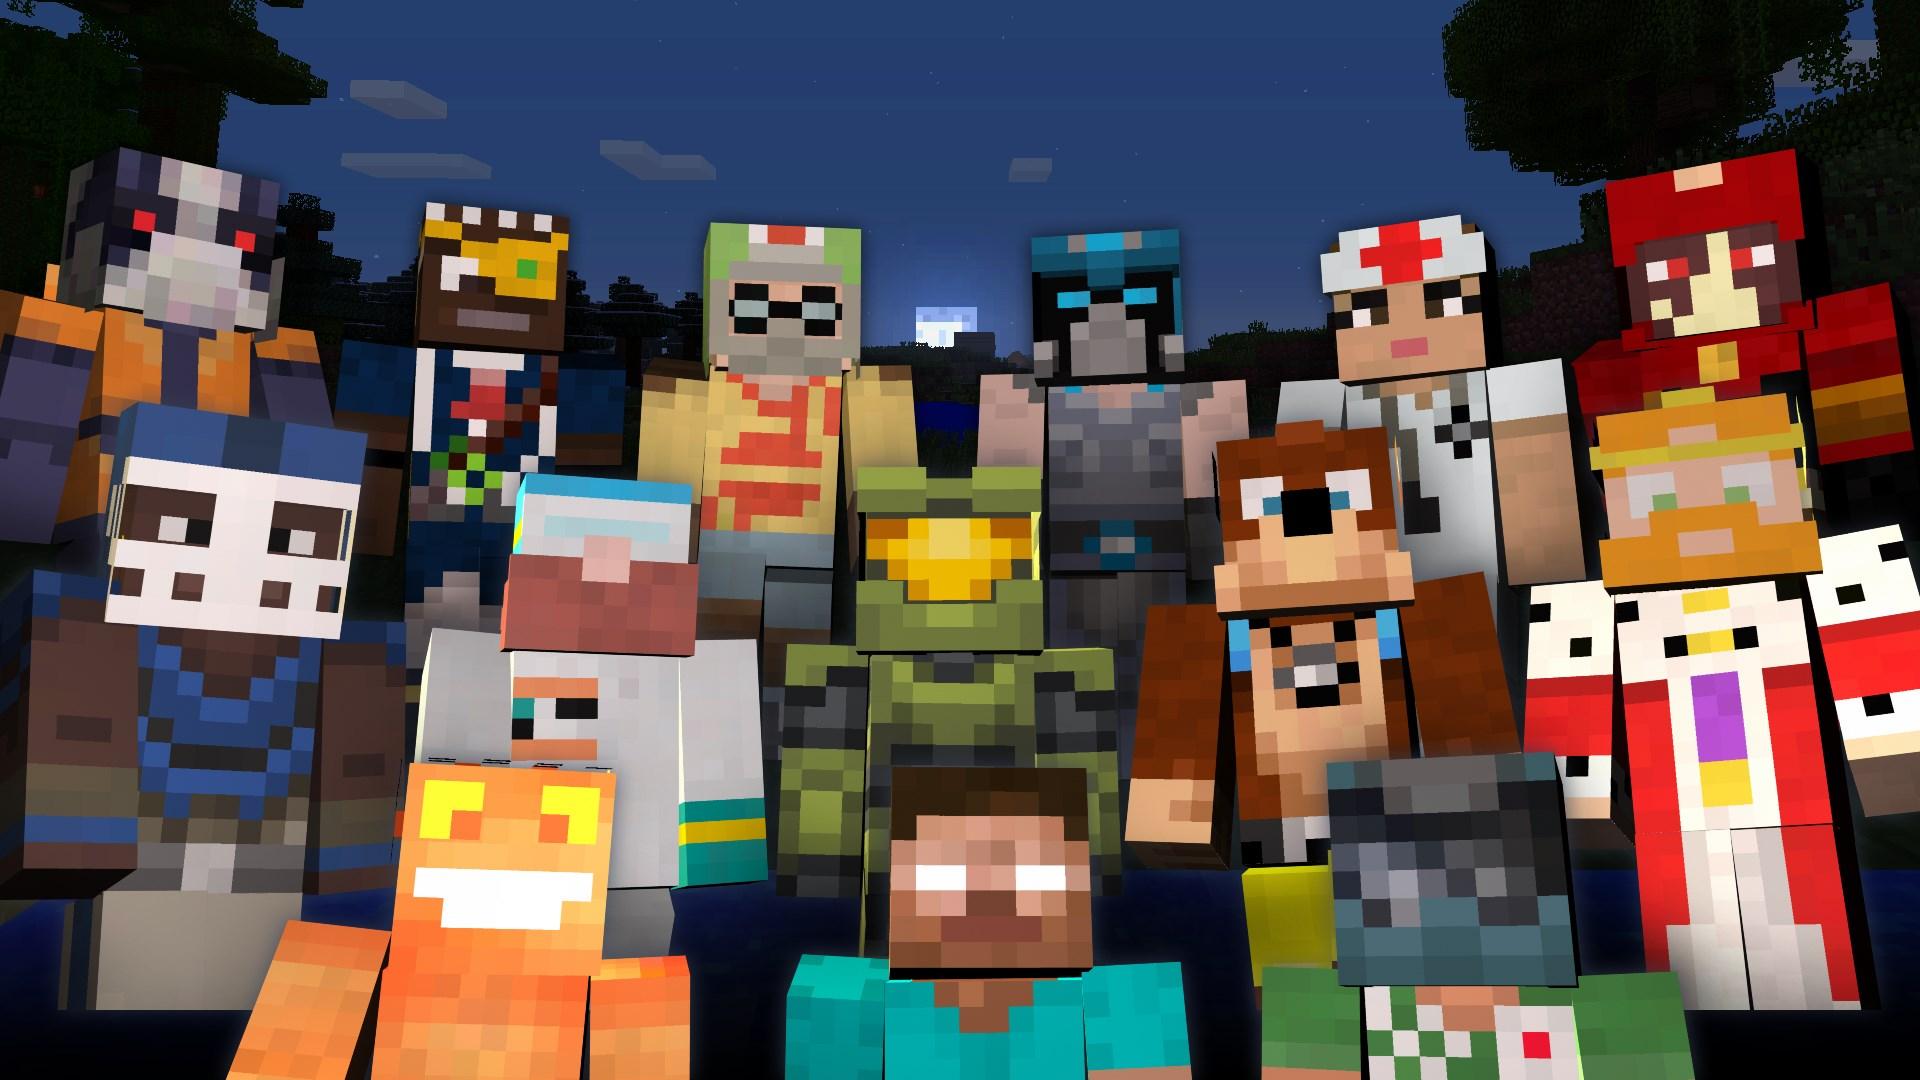 Buy Minecraft Skin Pack 1 - Microsoft Store